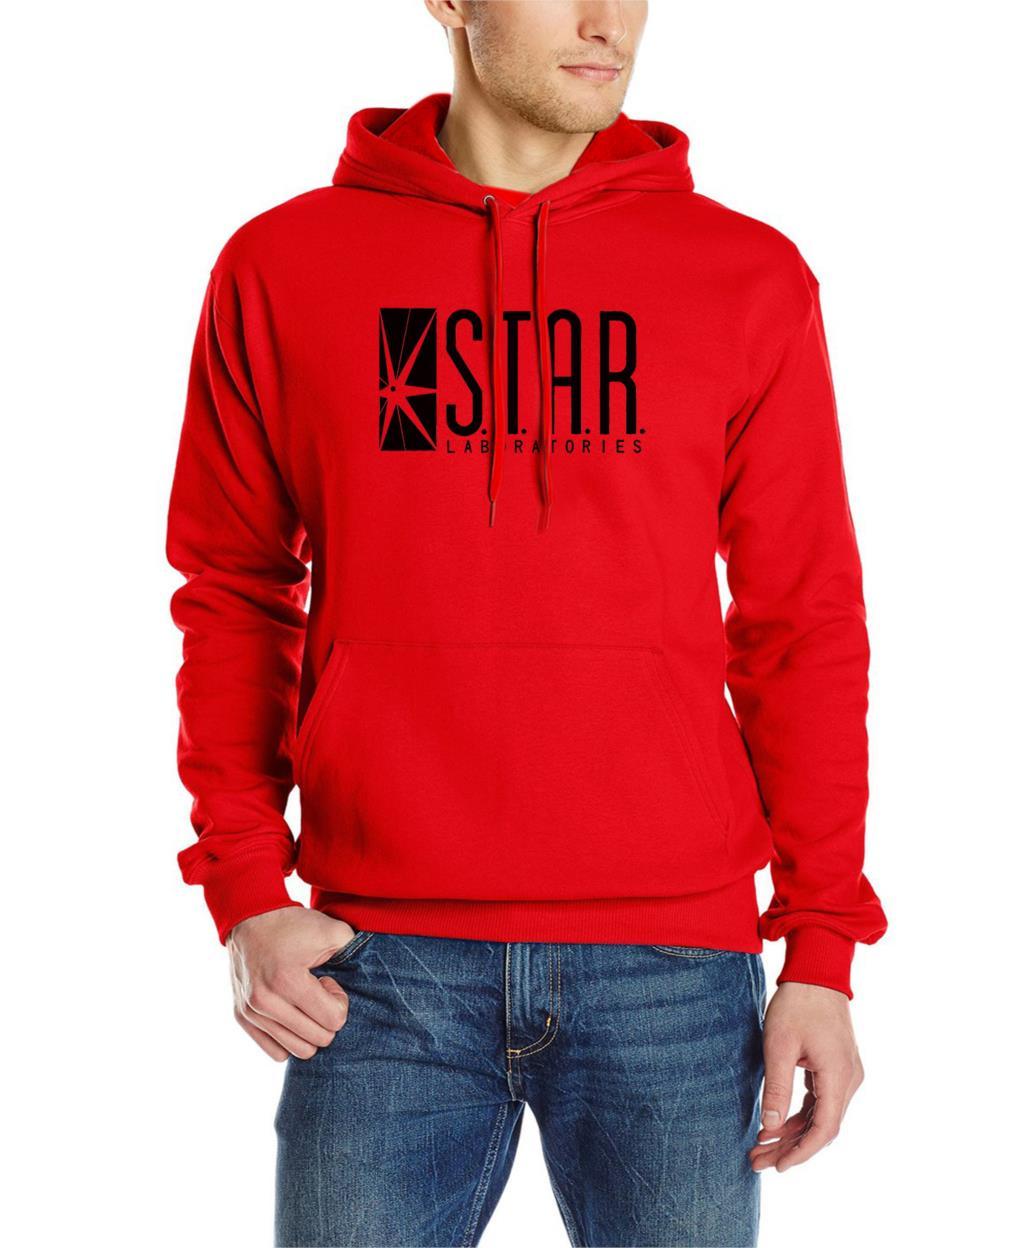 autumn brand hoodies superman series men hoody STAR S.T.A.R.labs jumper the flash gotham city comic books black sweatshirt 8